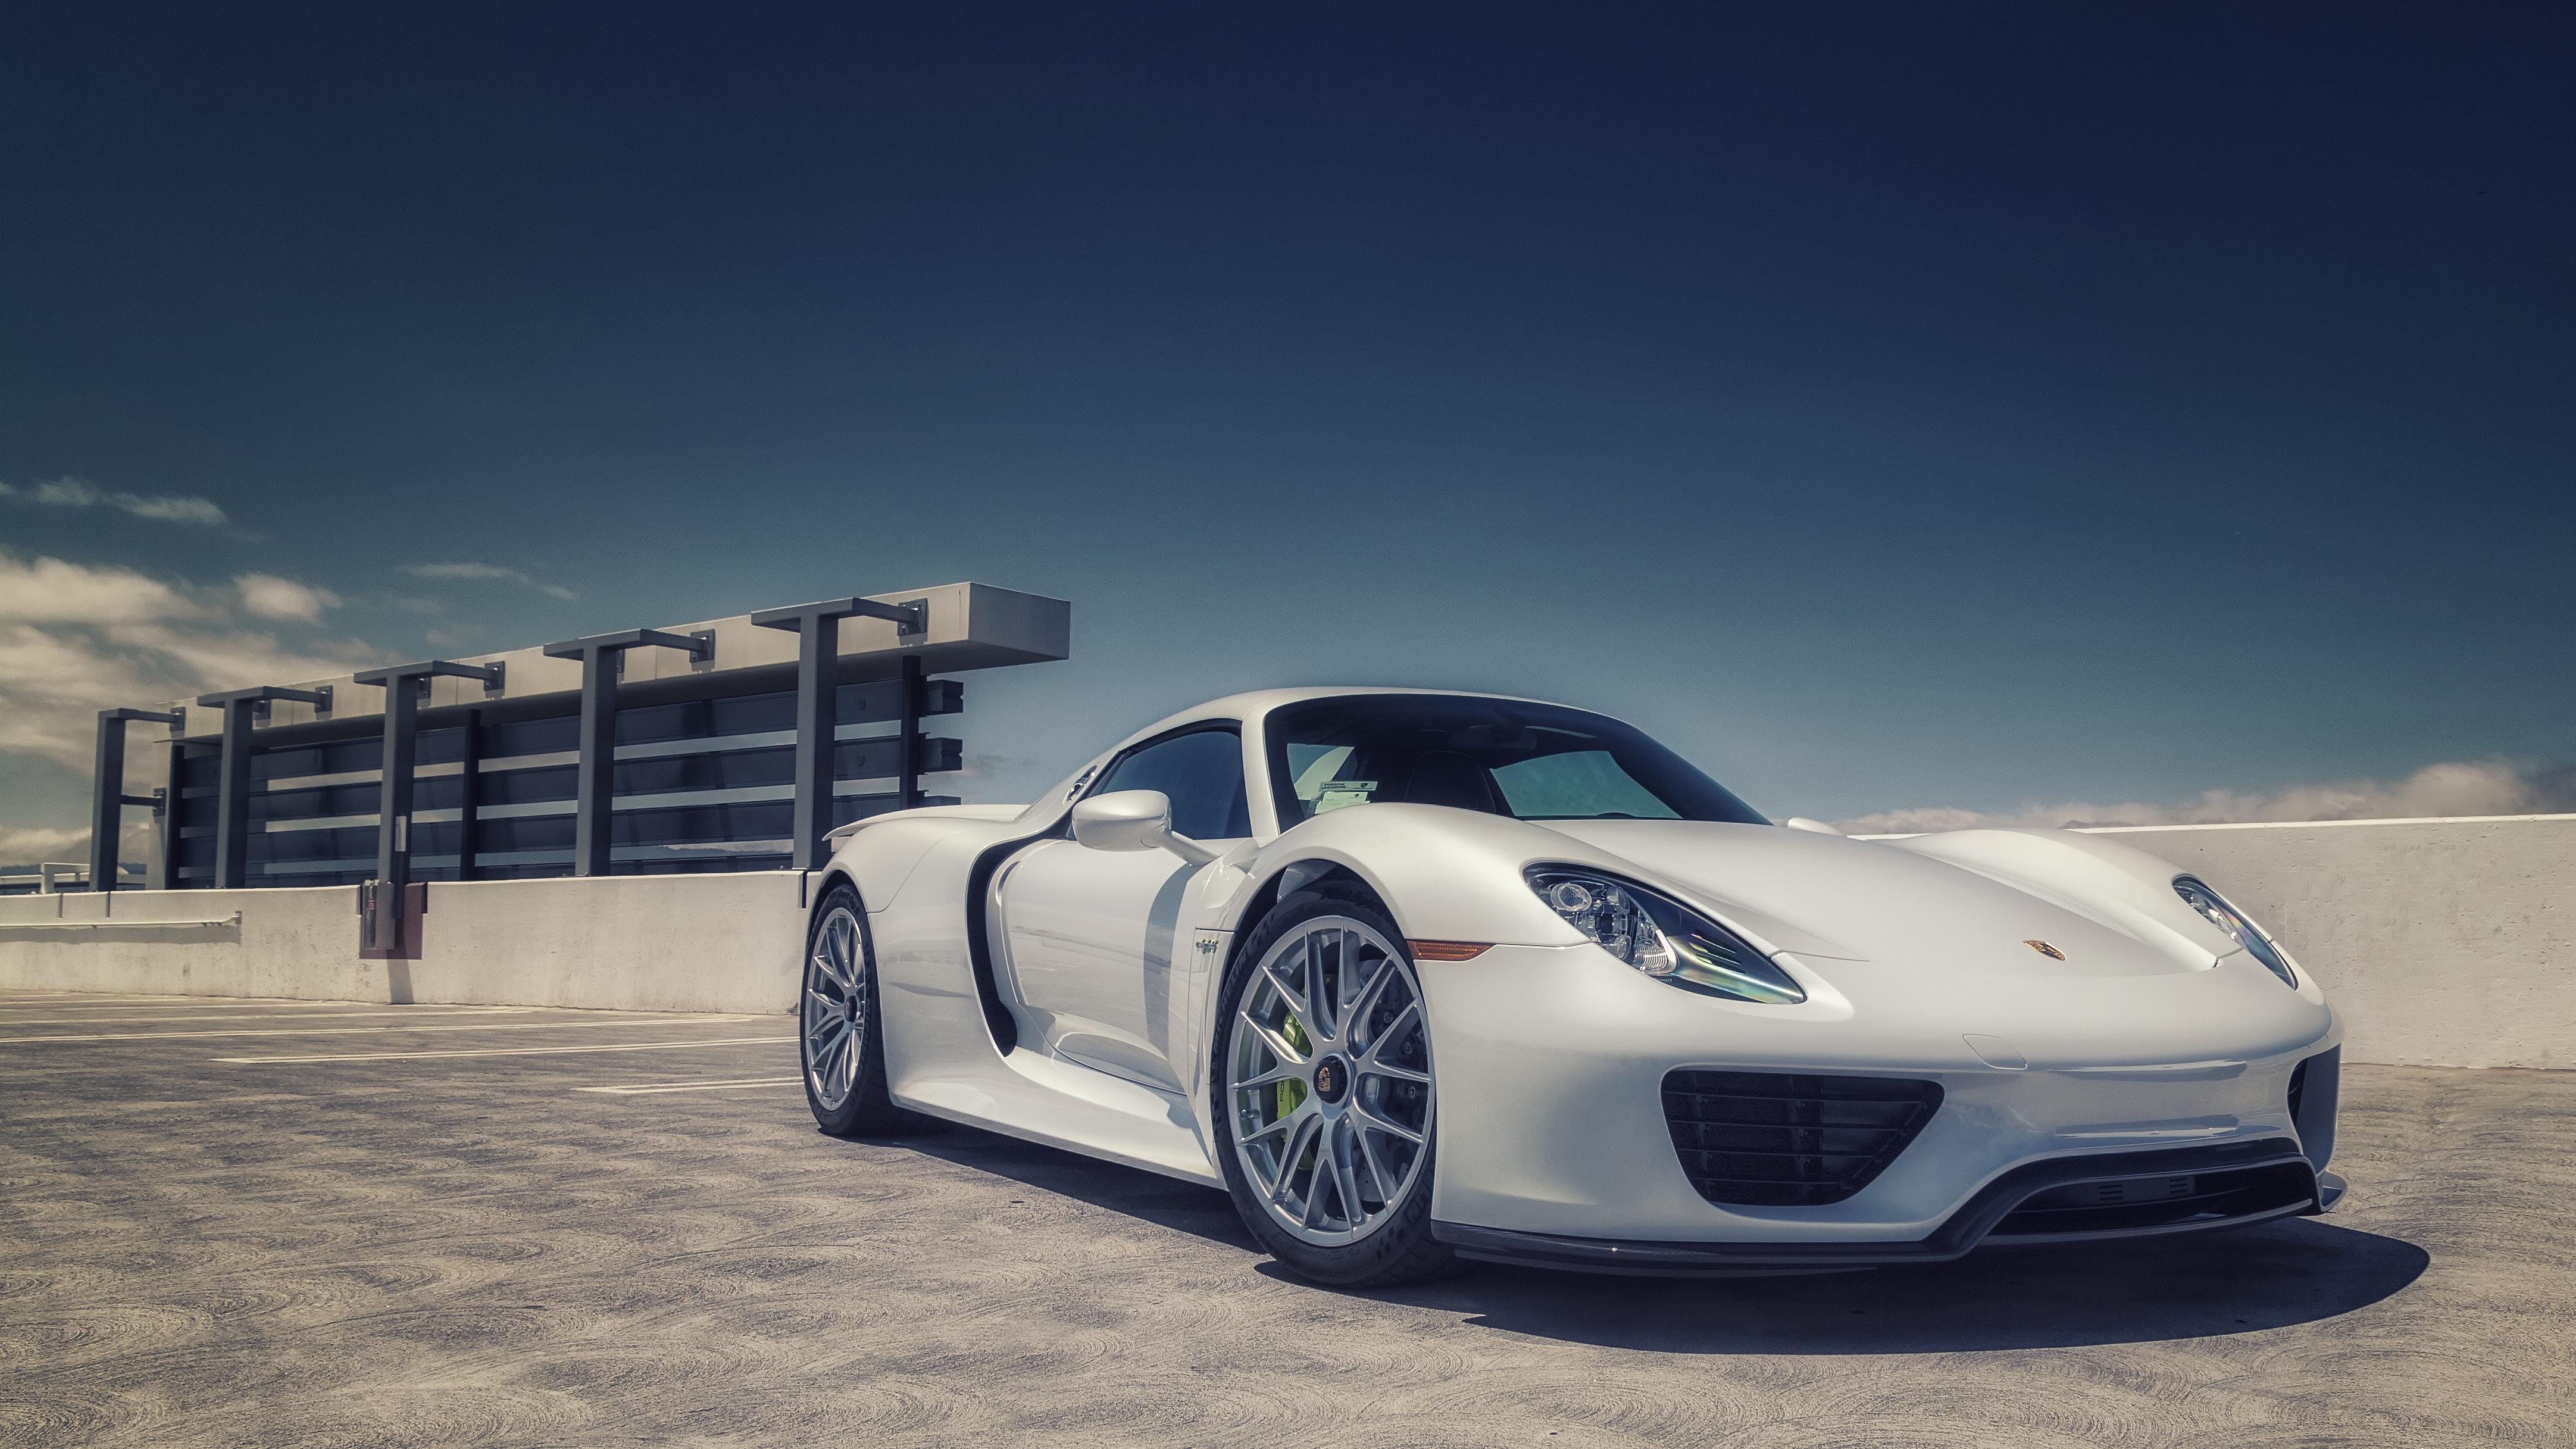 Porsche 918 Spyder 4k Ultra HD Wallpaper And Background Image